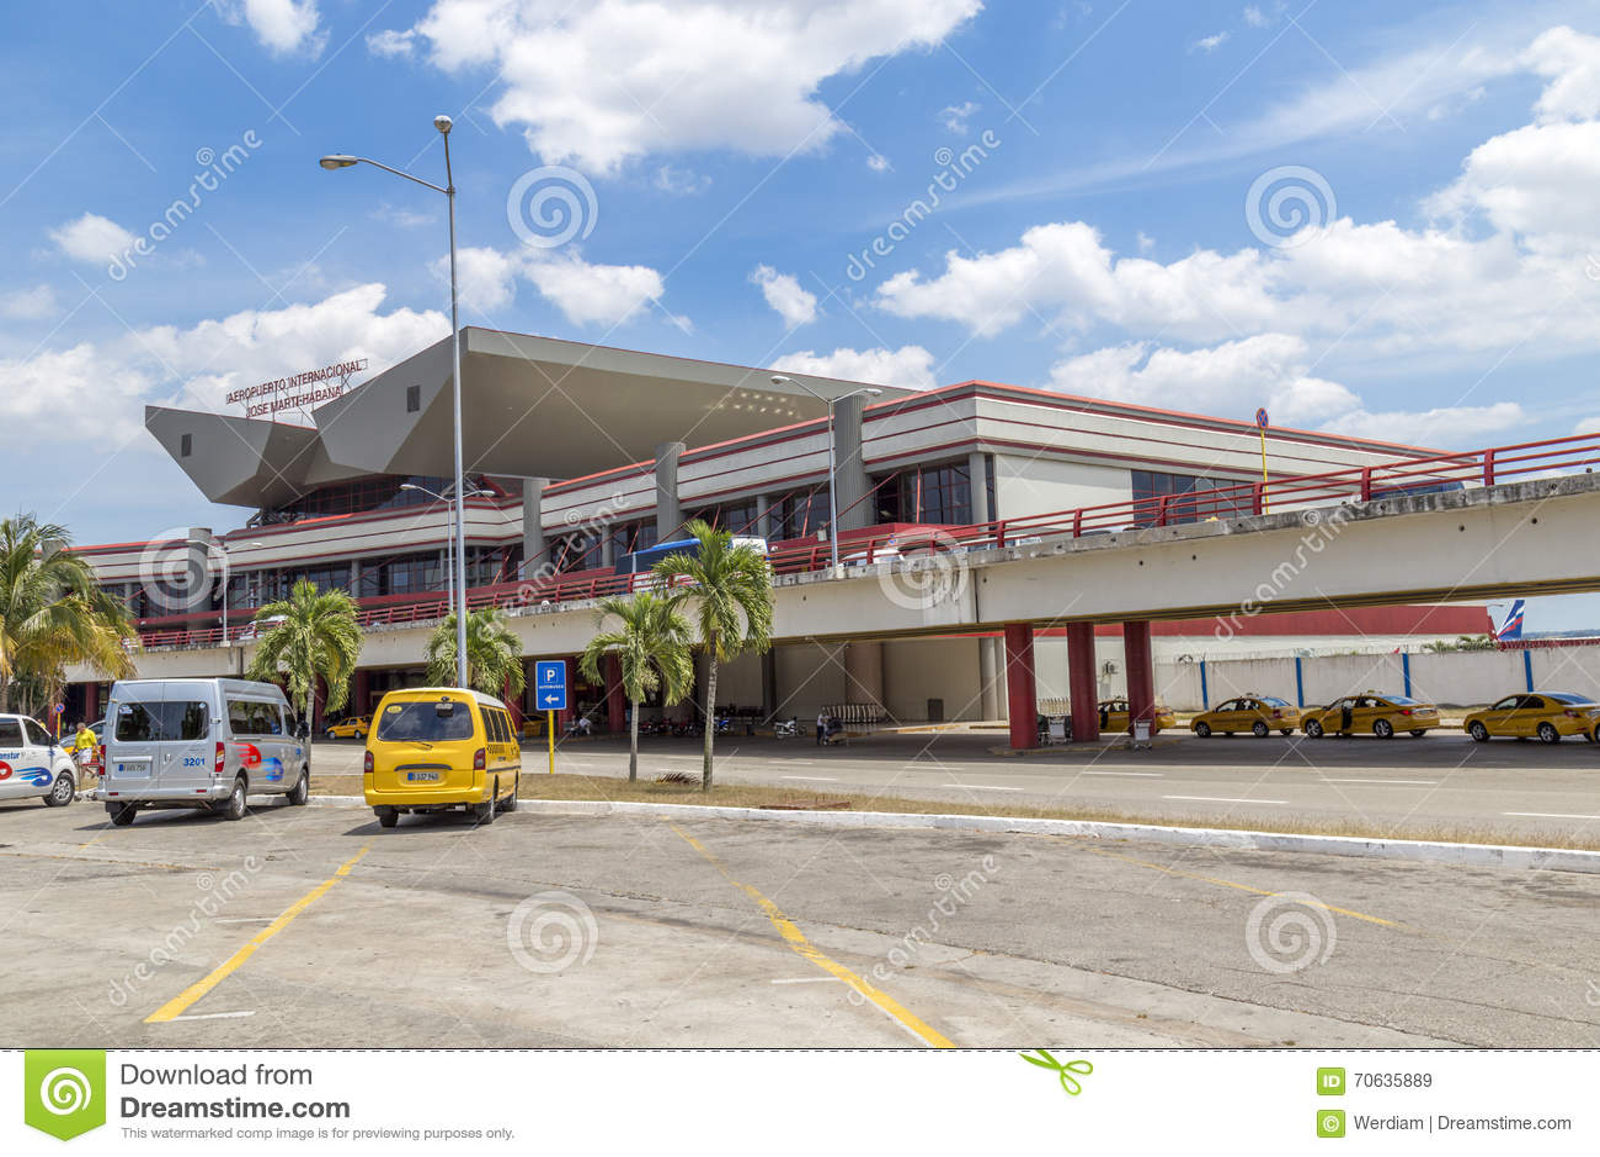 Aeroporto Havana Arrivi : International airport jose marti havana cuba editorial stock